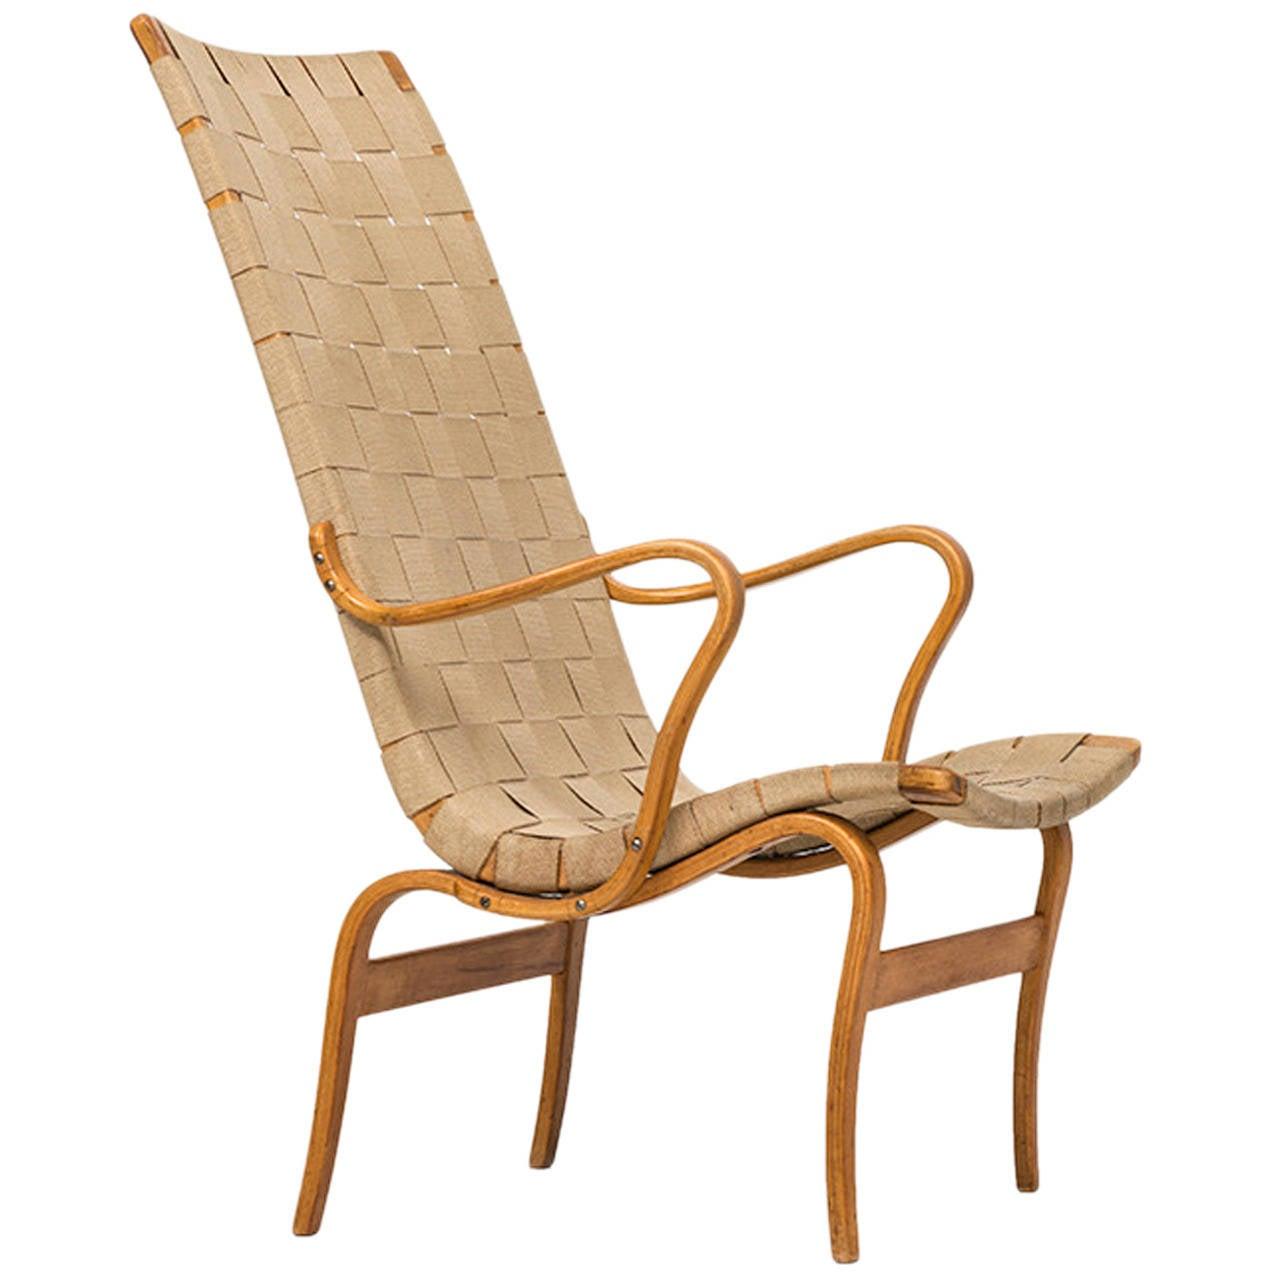 Bruno Mathsson High-Back Eva Chair, Produced by Karl Mathsson in Sweden